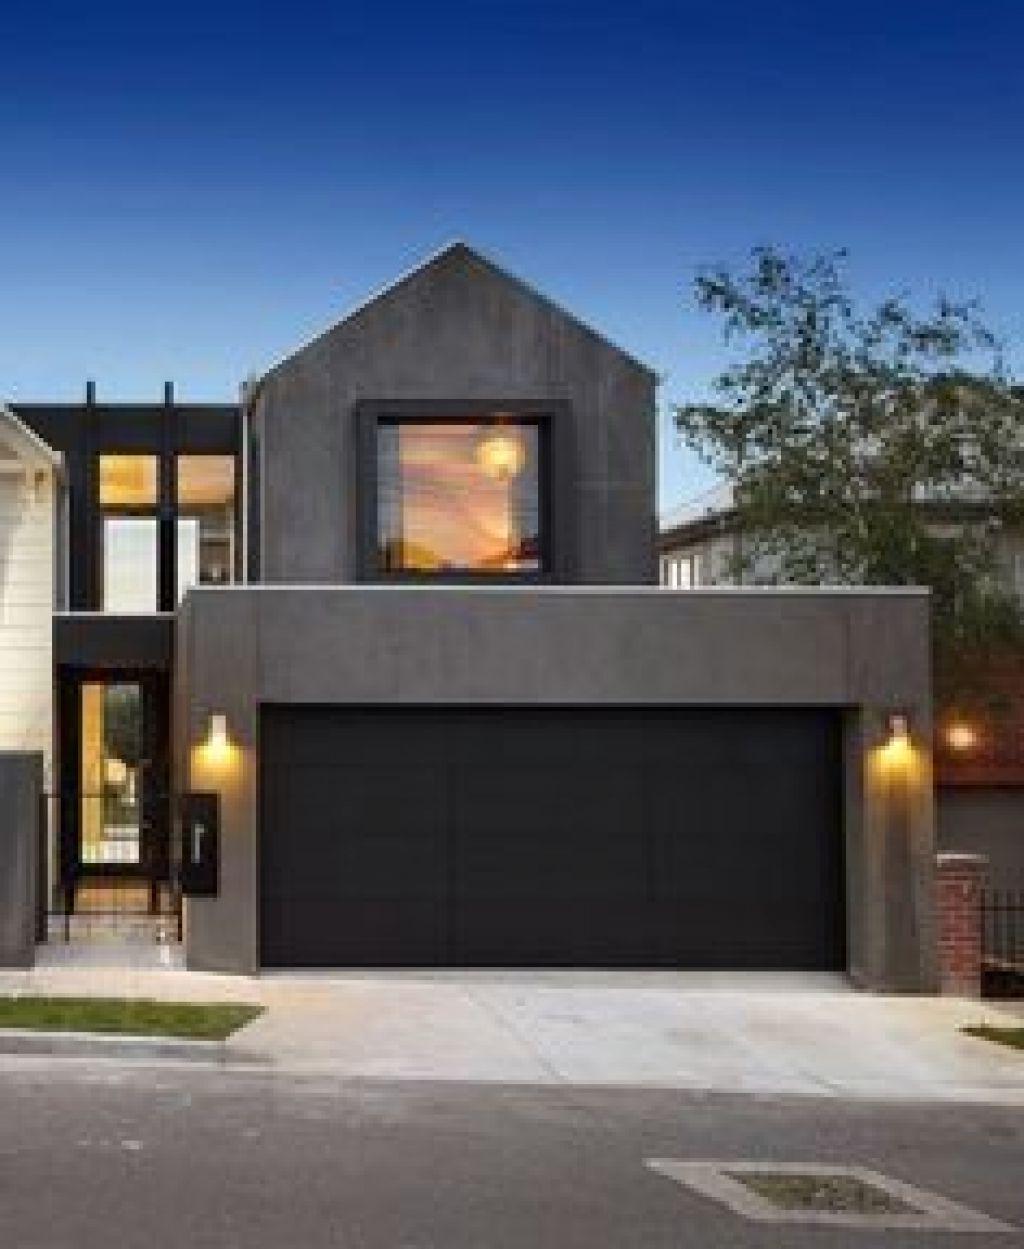 27 Best Modern Garage Door Ideas And Designs For Your Inspiration Interiorsherpa